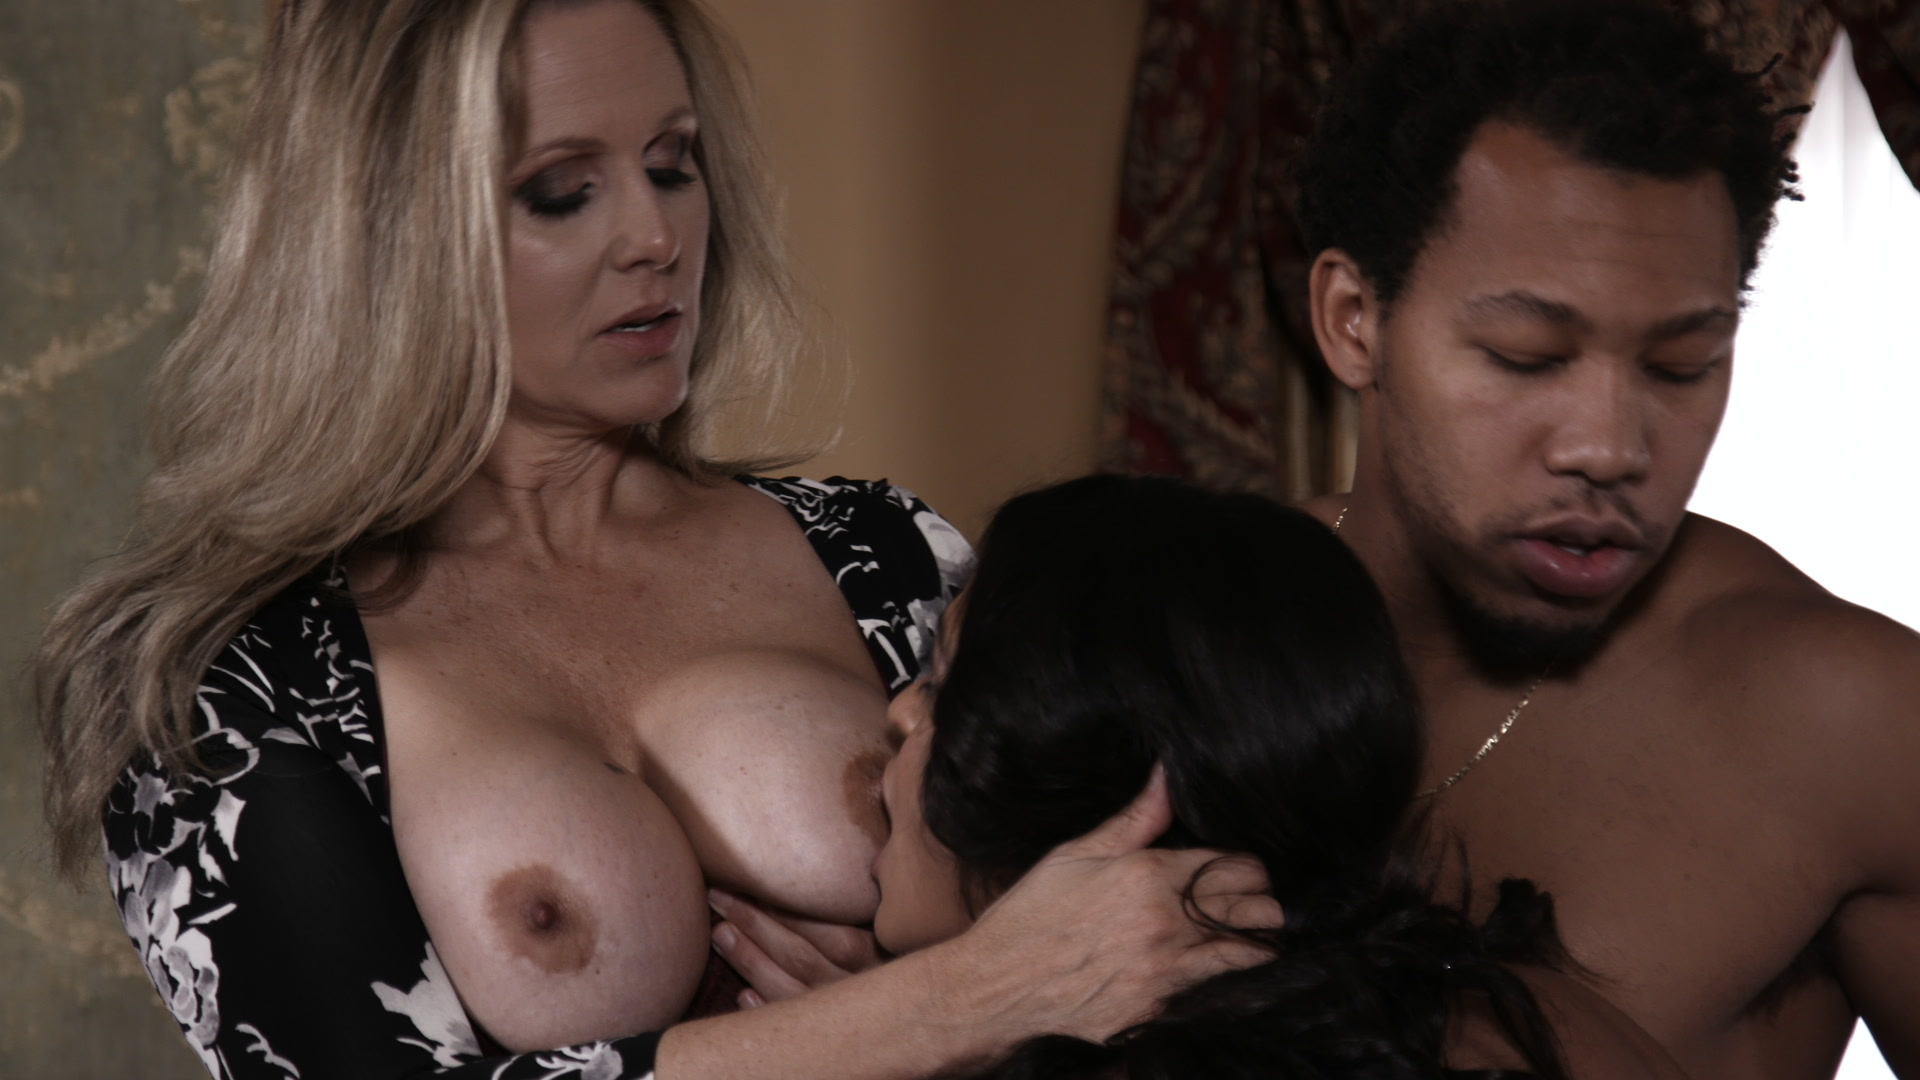 My Wife Has Black Boyfriend Porn my stepmom's black boyfriend and me (2017) | adult dvd empire